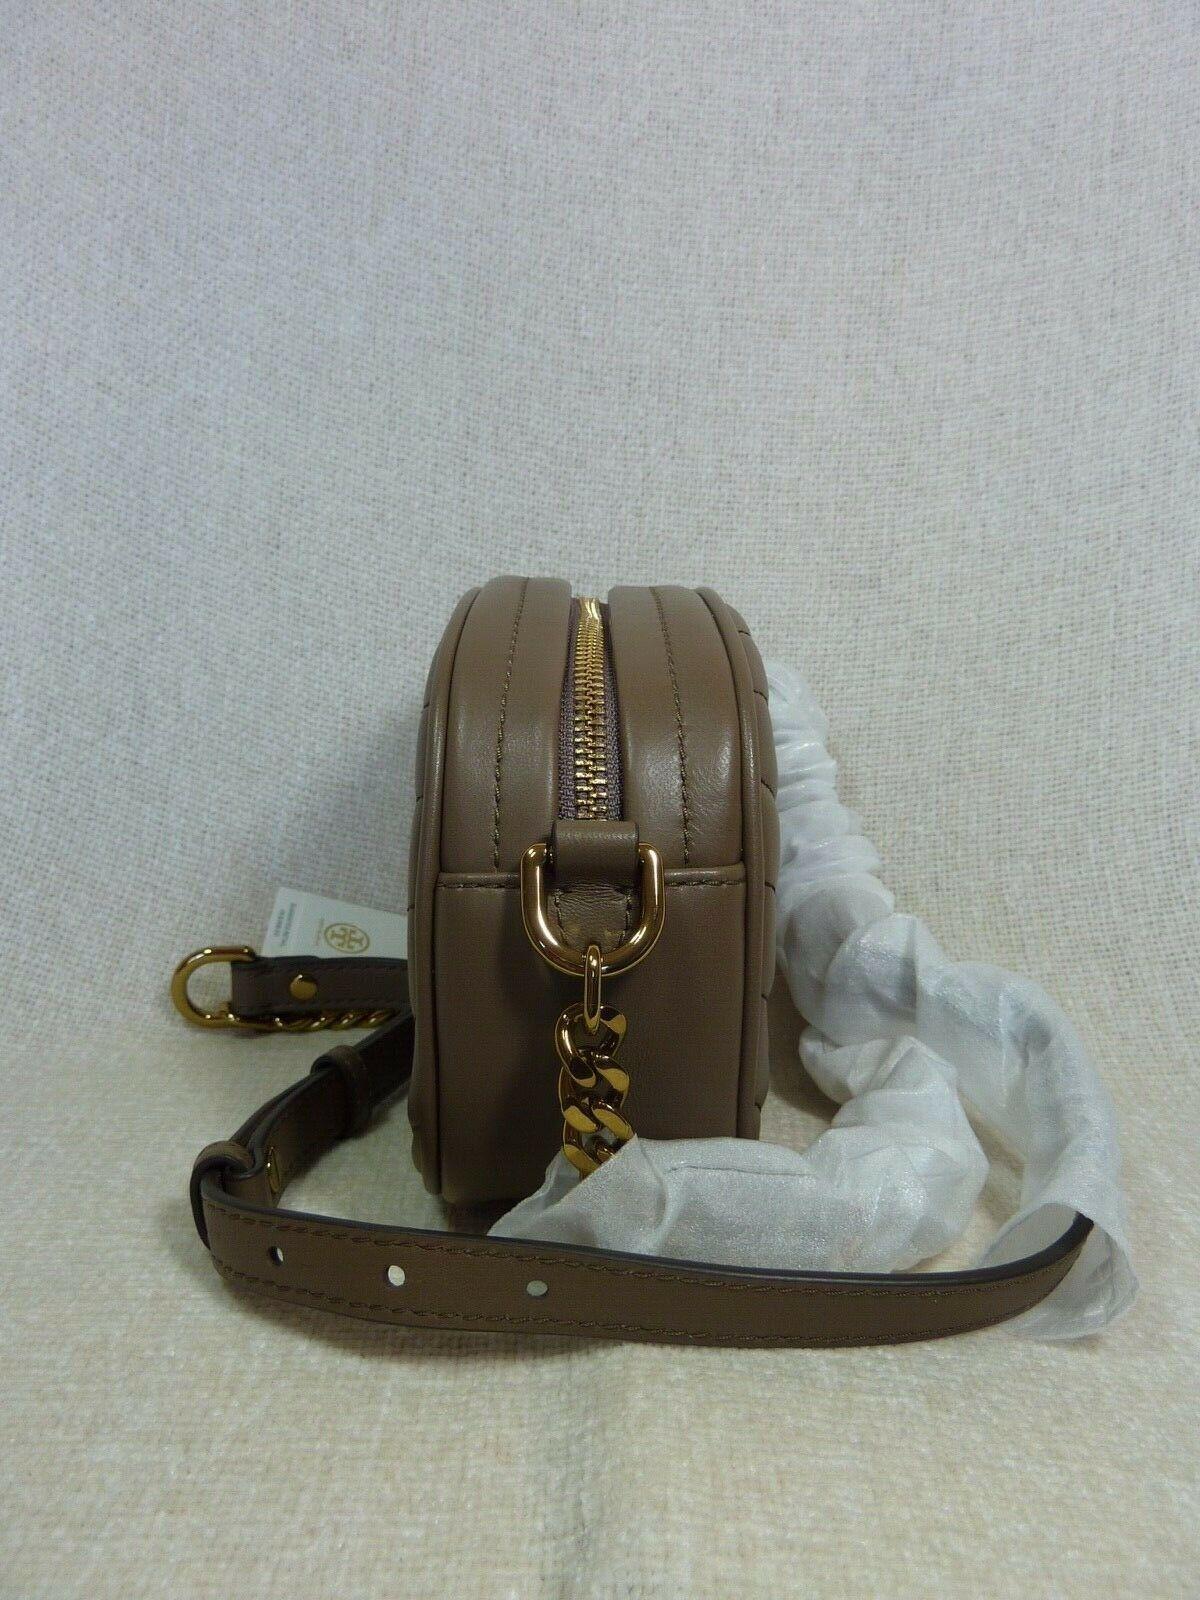 NWT Tory Burch Classic Taupe Kira Chevron Small Camera Bag $358 image 3